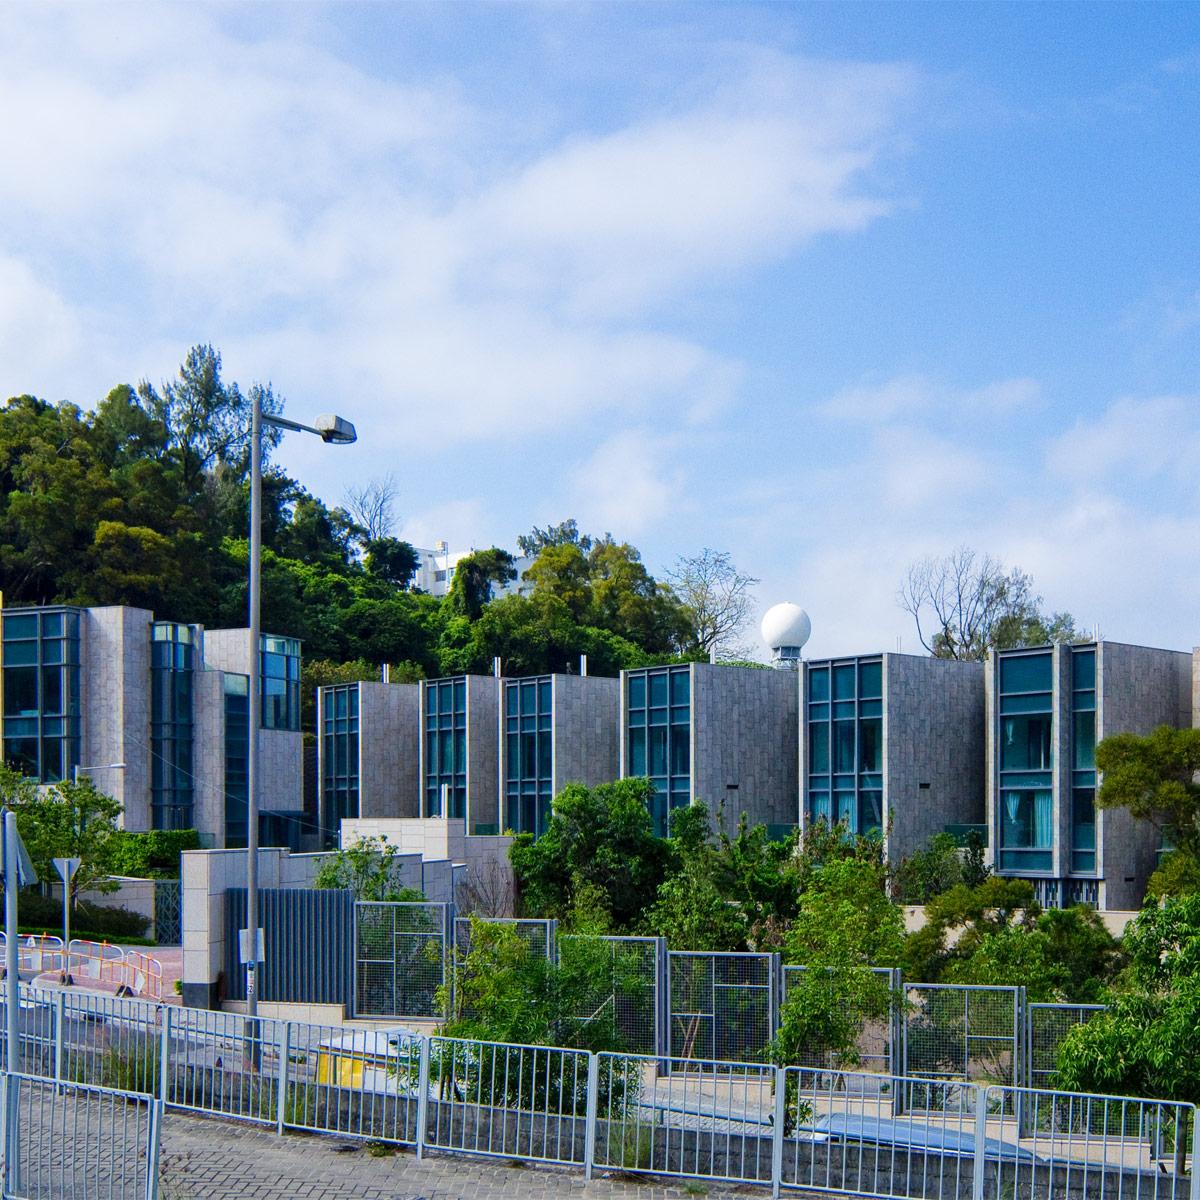 Seaside Castle, Residential Development at 9 Ching Lai Road, Tai Lam, Tuen Mun, N.T.